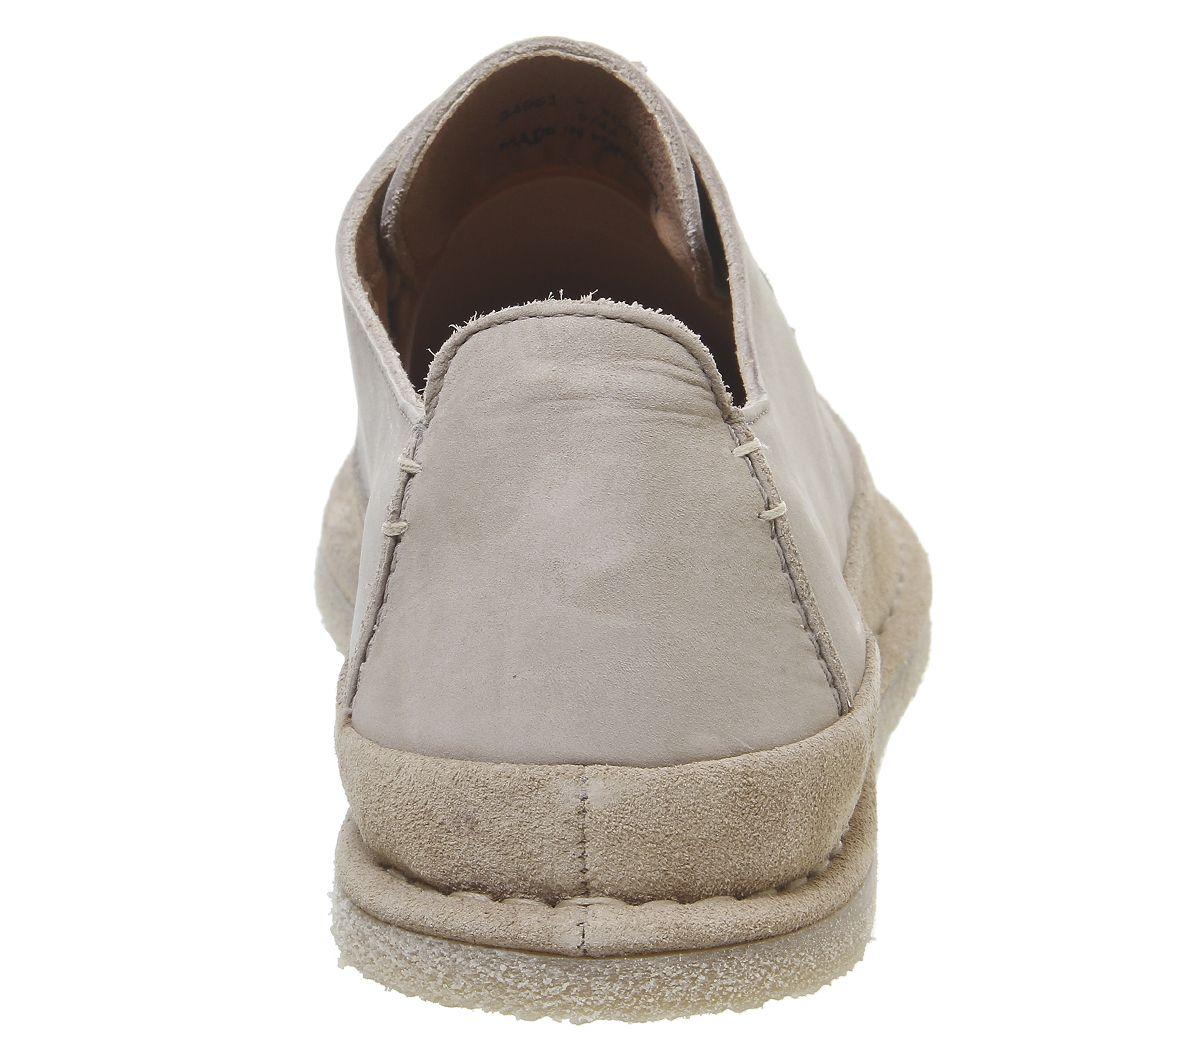 Mens-Office-Lark-Derby-Lace-Up-Shoes-Beige-Nubuck-Casual-Shoes thumbnail 4